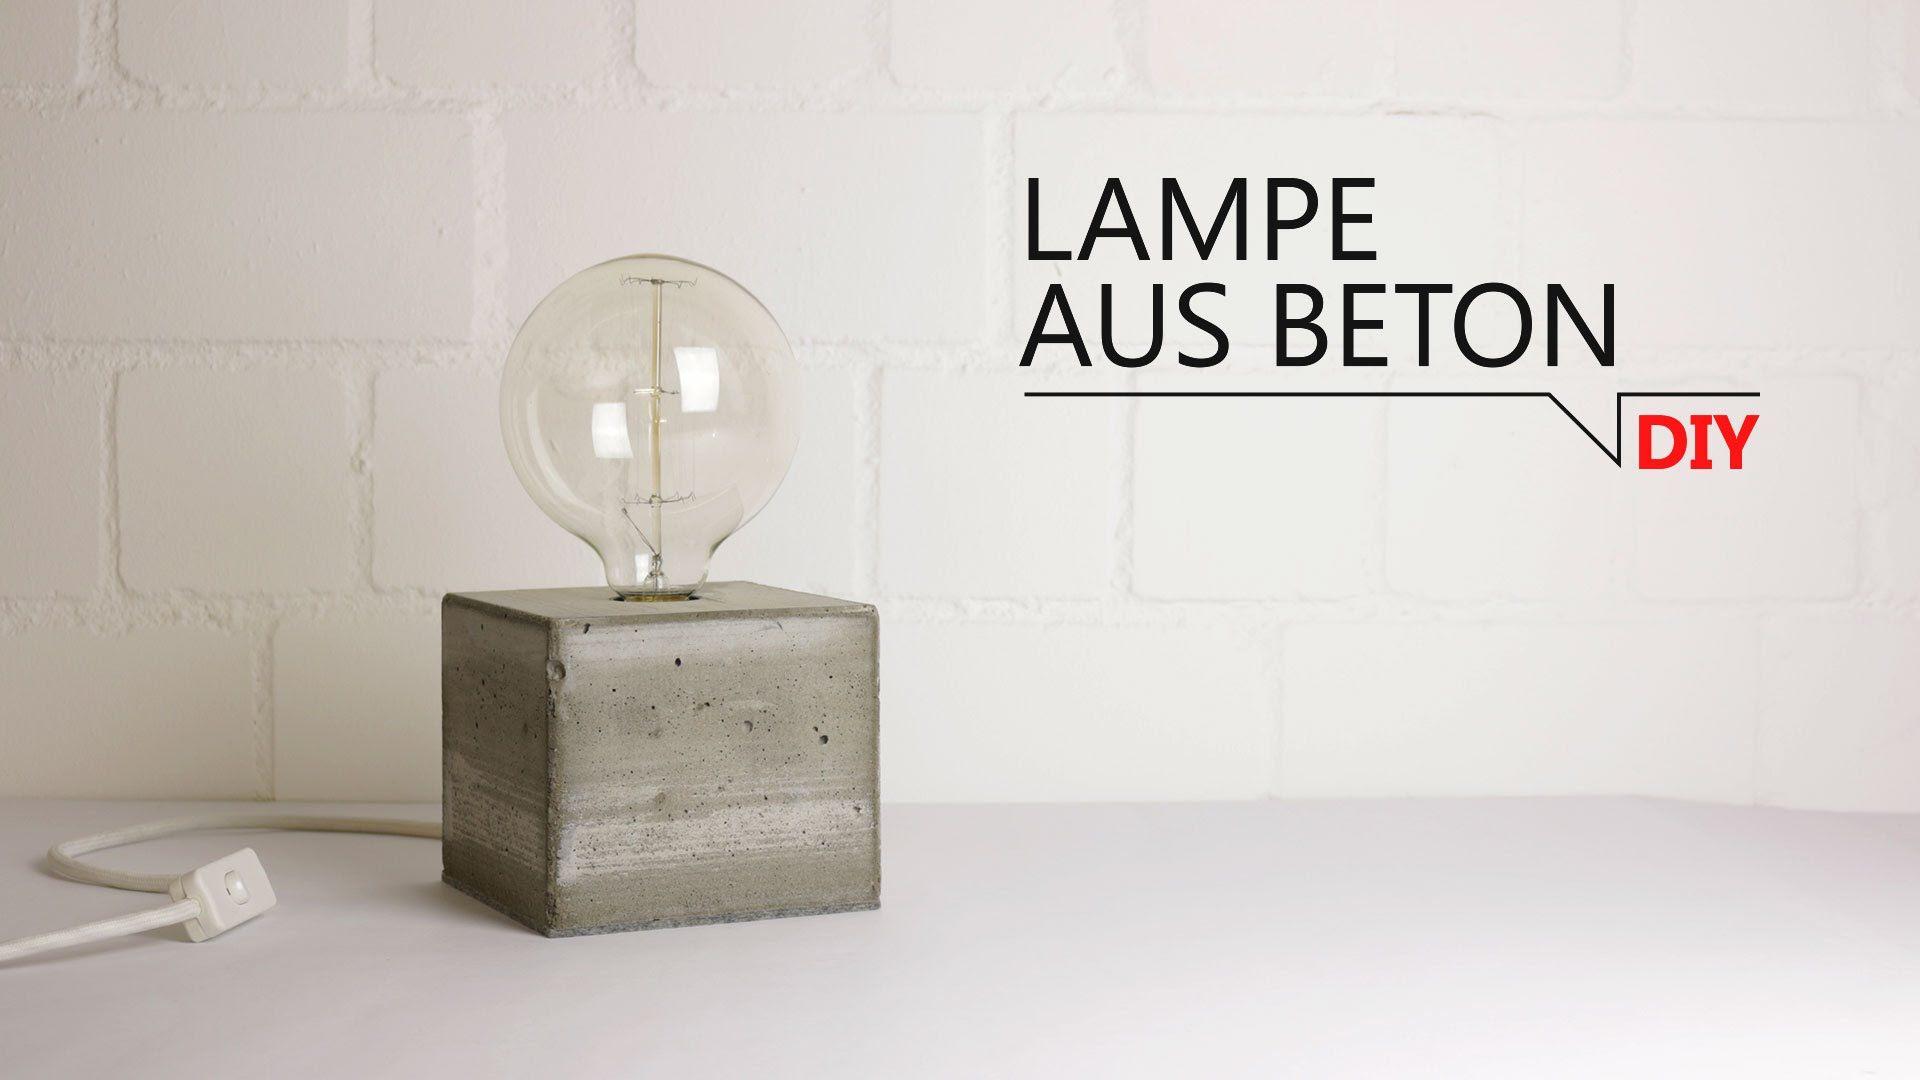 diy lampe aus beton ideen lampen diy lampen und lampen basteln. Black Bedroom Furniture Sets. Home Design Ideas